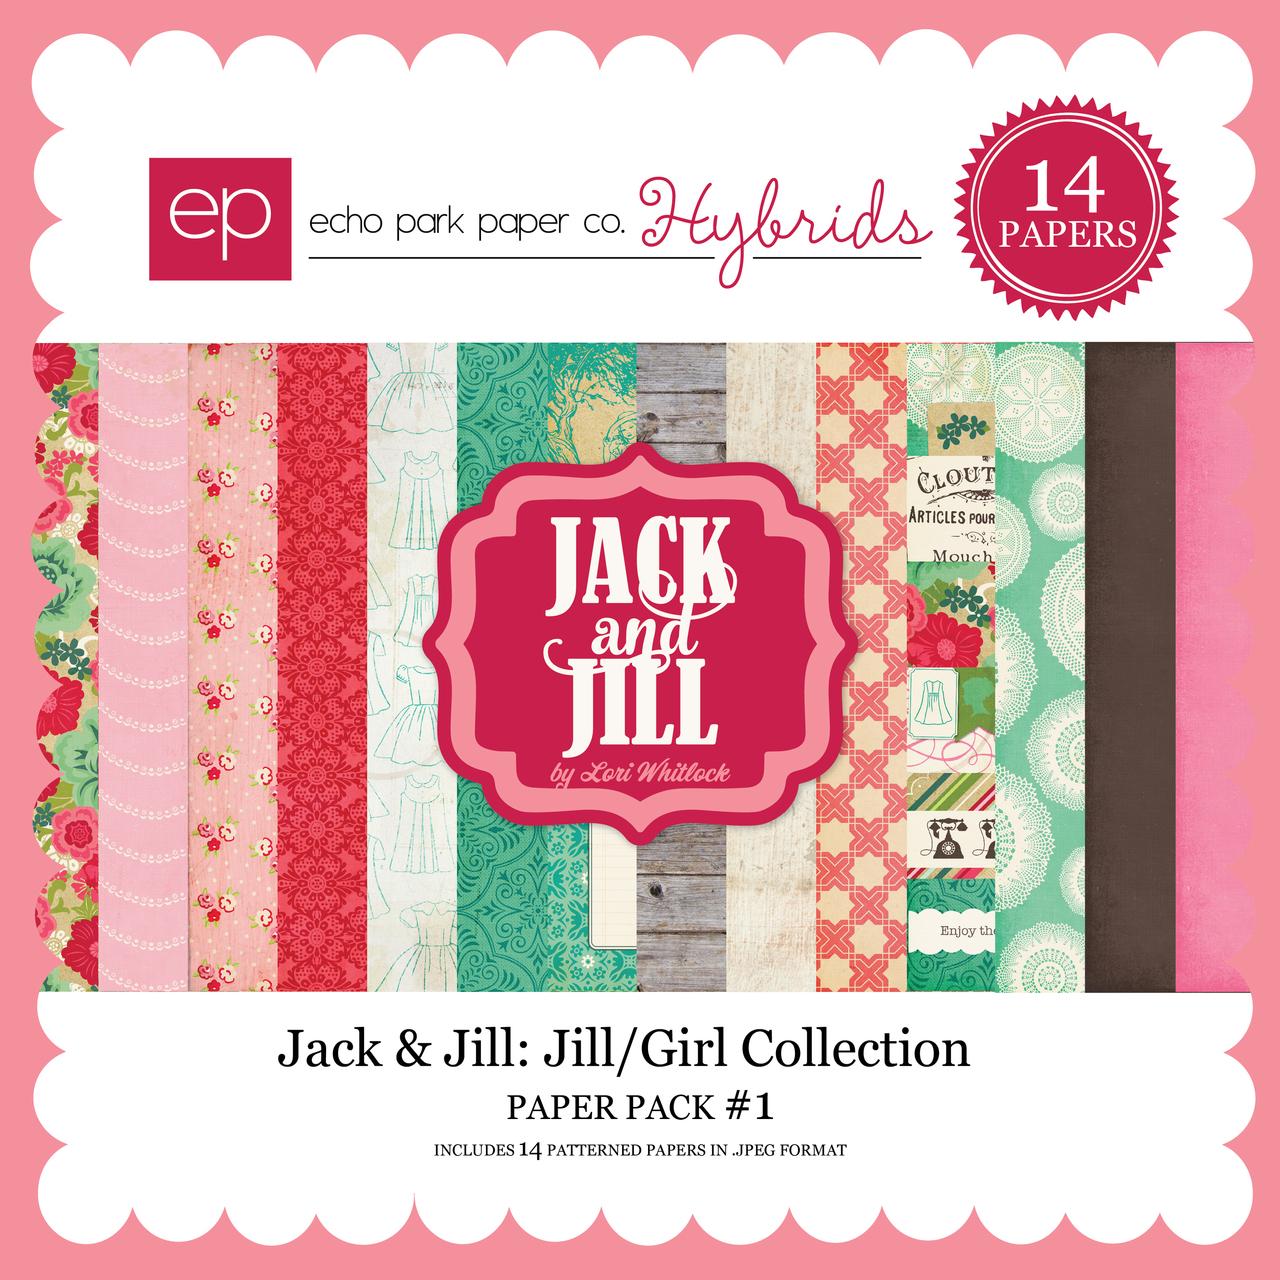 Jack & Jill: Jill/Girl Paper Pack #1